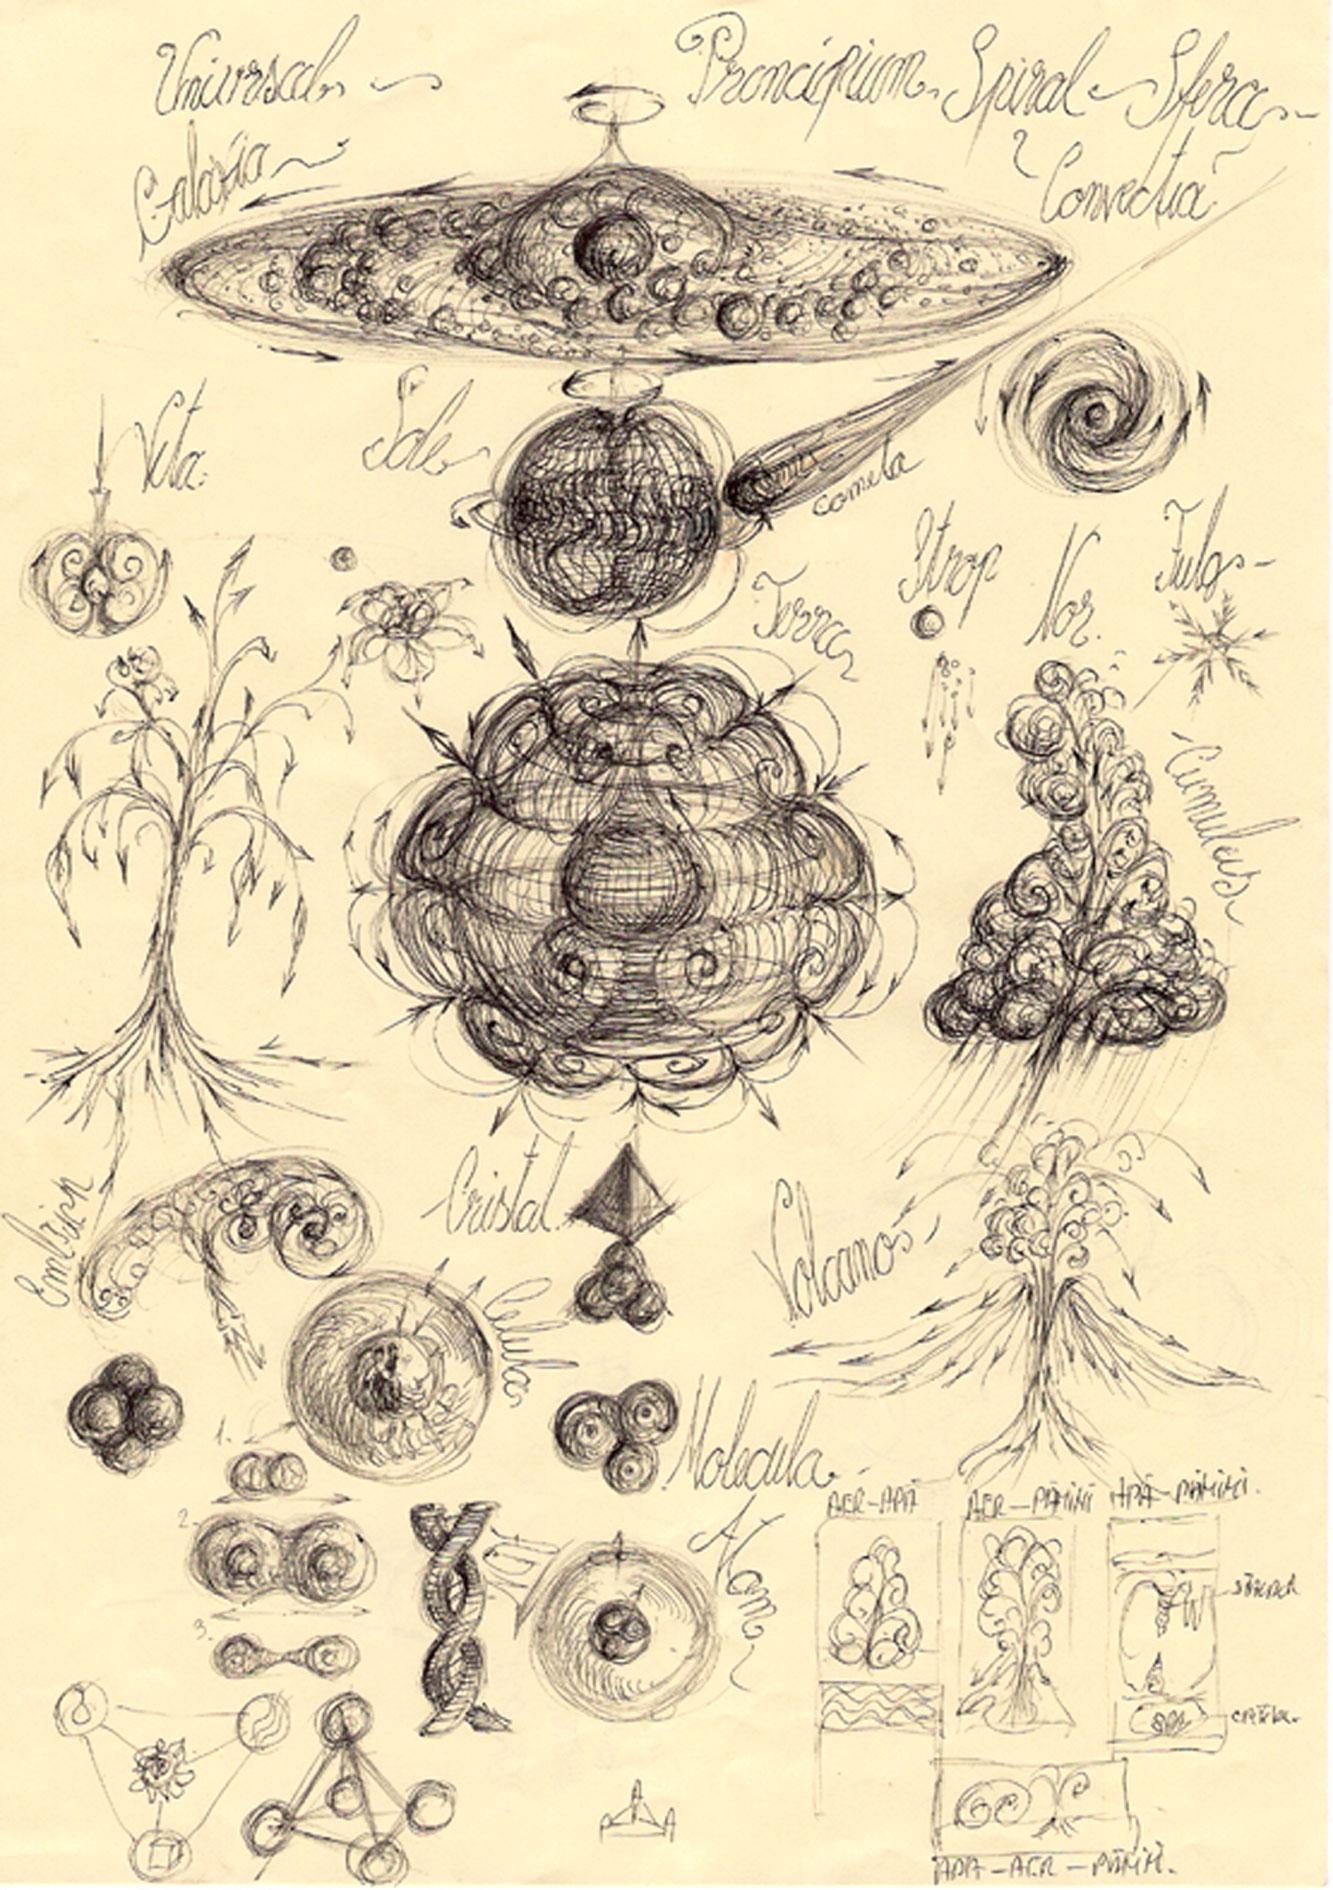 Gabriel Kelemen, Universal Sphere-Vortex Principium Theory, 1 Universality of macro-meso-microcosmic sphere hierarchies.